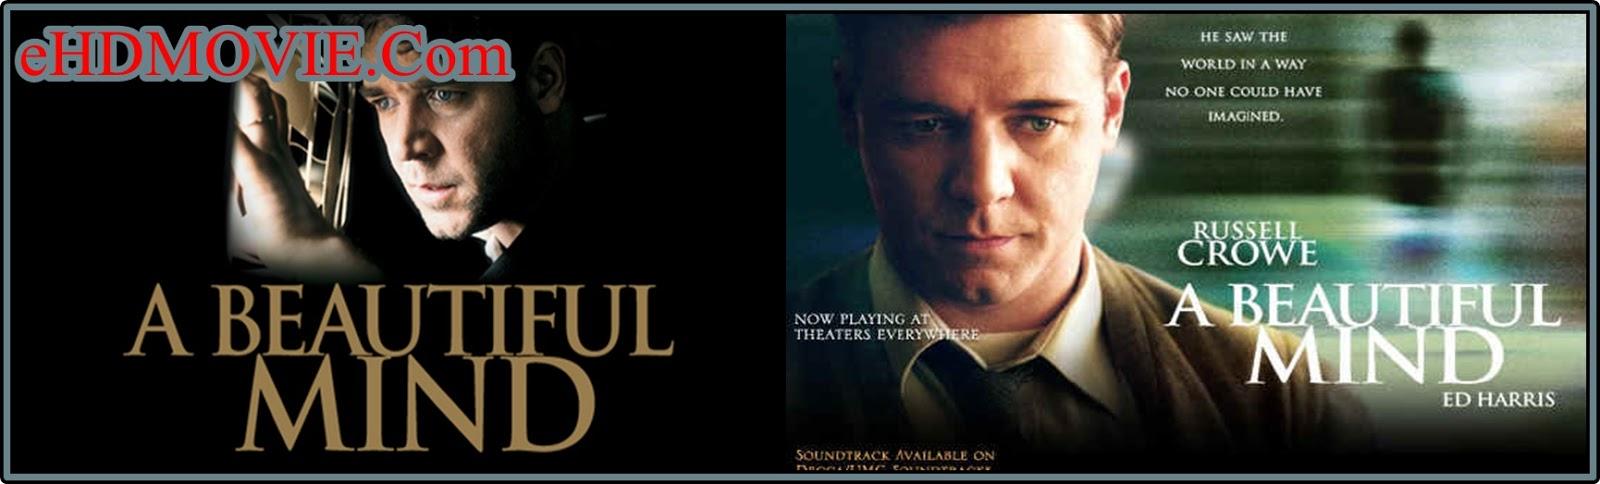 A Beautiful Mind 2001 Full Movie English 720p - 480p ORG BRRip 500MB - 1GB ESubs Free Download